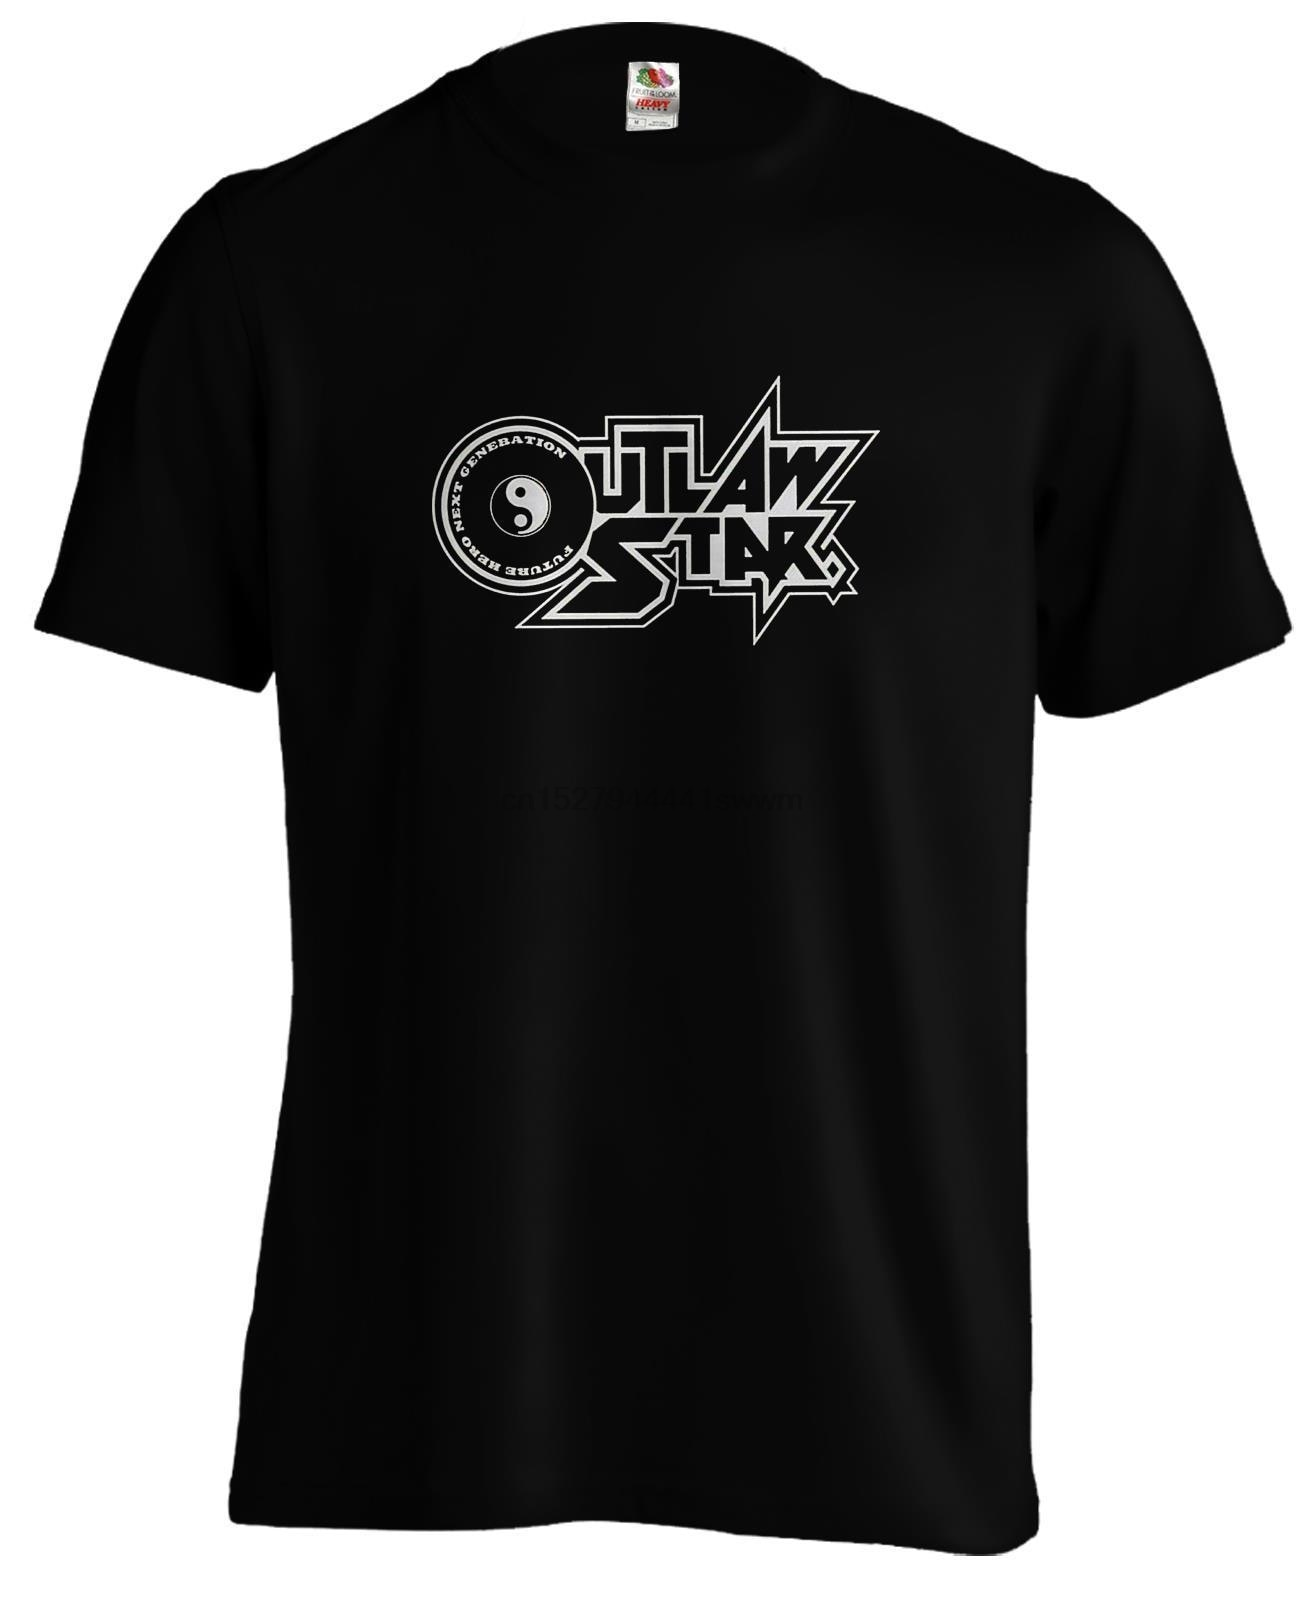 Camiseta de Manga de Anime con Logo de Gener Starwind DE LA ESTRELLA DE outley suelto tamaño